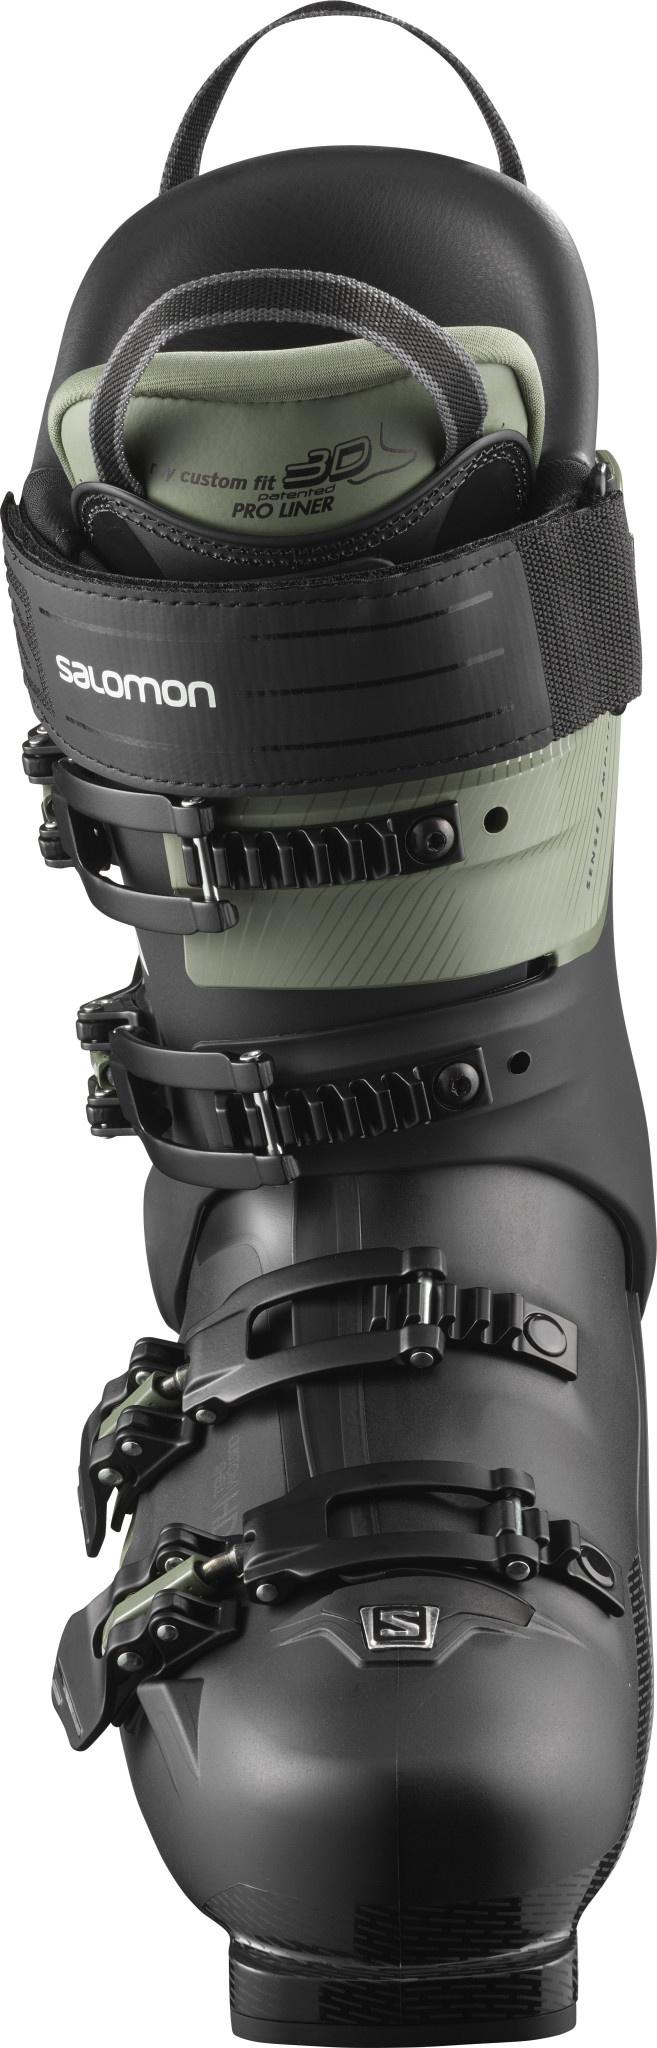 Salomon S/Pro 120-3